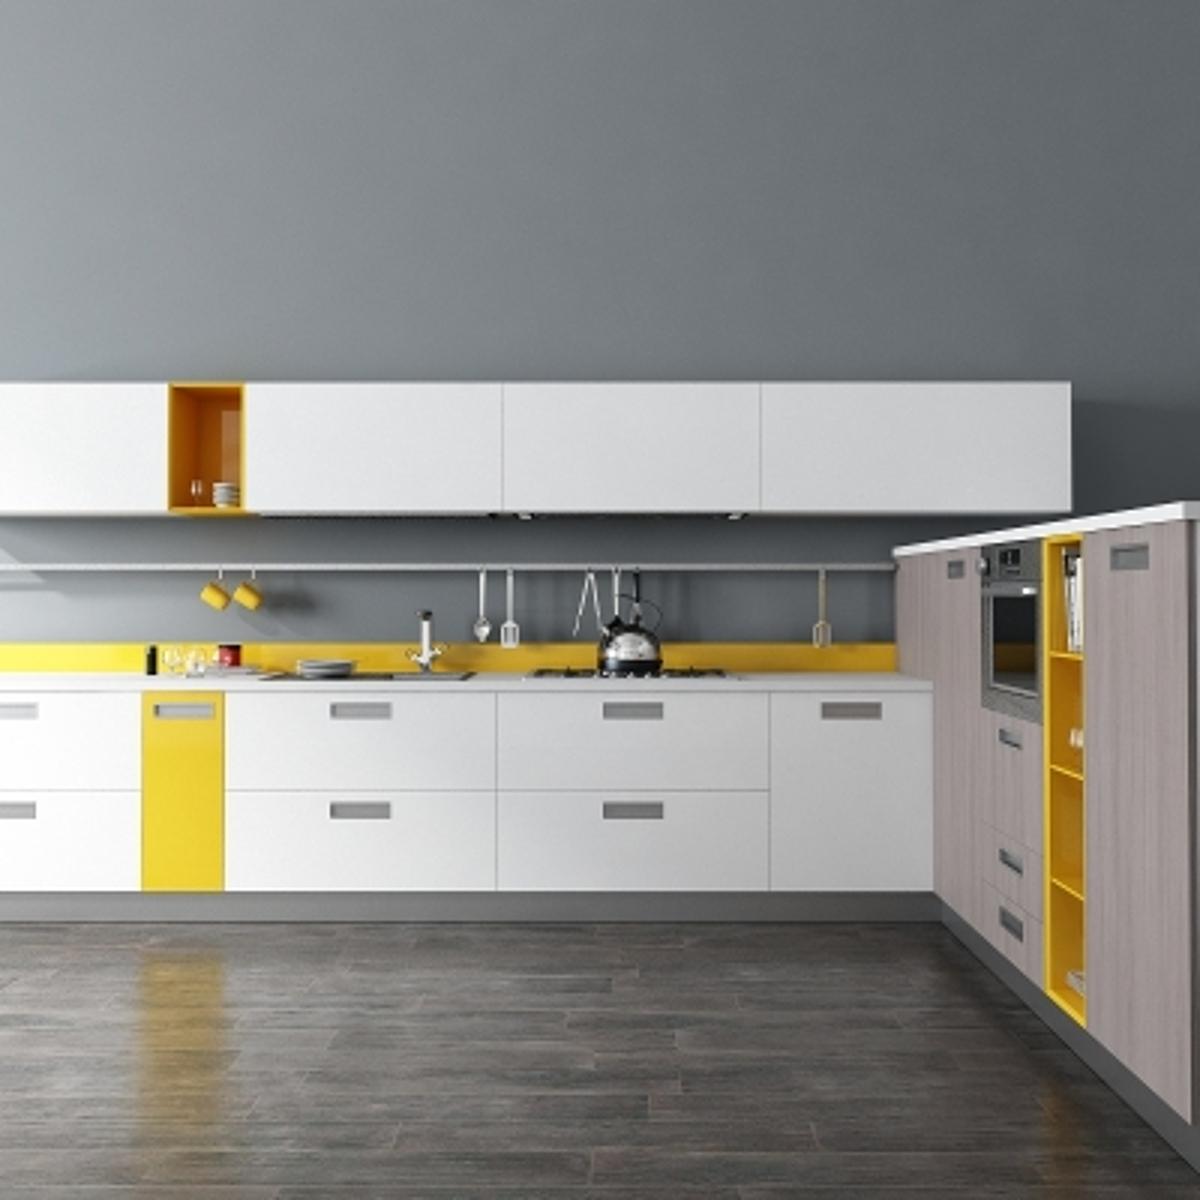 cg235现代厨房橱柜模型